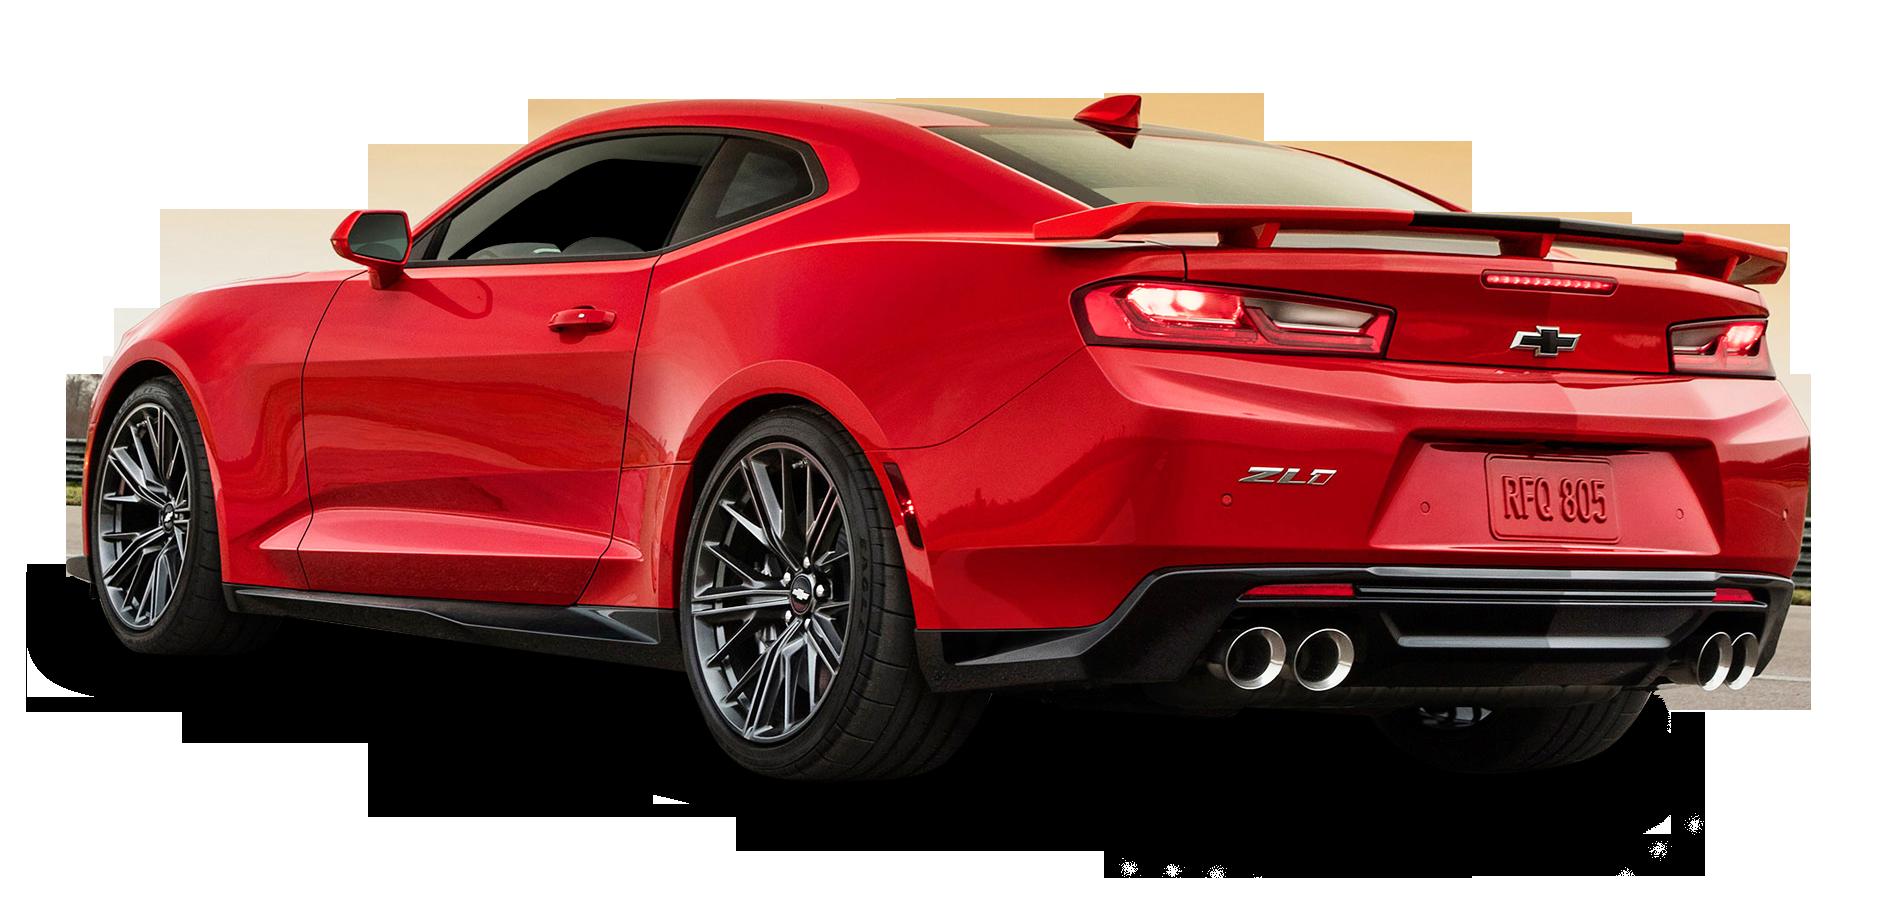 Torch Red Grandsport Convertible Wow Corvette Chevy Corvette Corvette Convertible